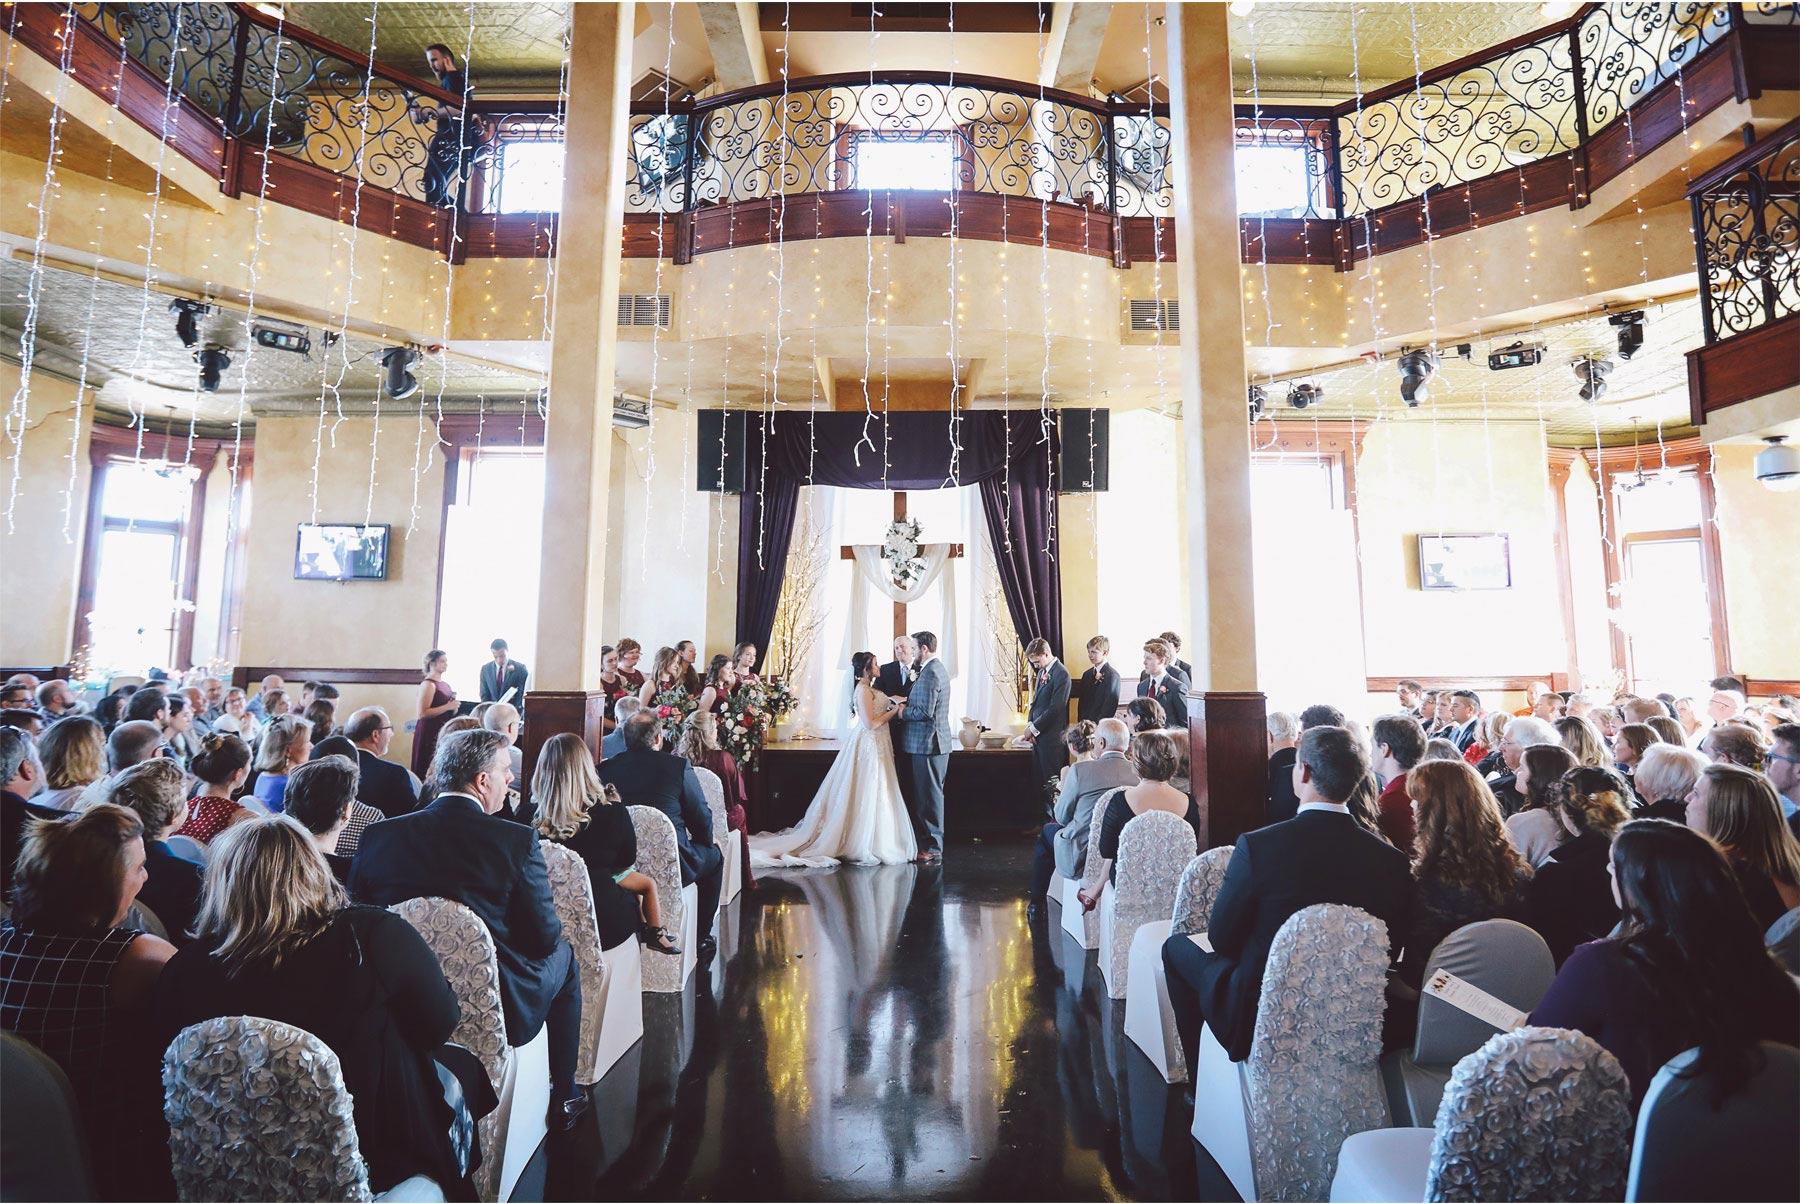 13-Minneapolis-Wedding-Photography-by-Vick-Photography-Historic-Concord-Exchange-Ceremony-Rachael-and-Benjamin.jpg